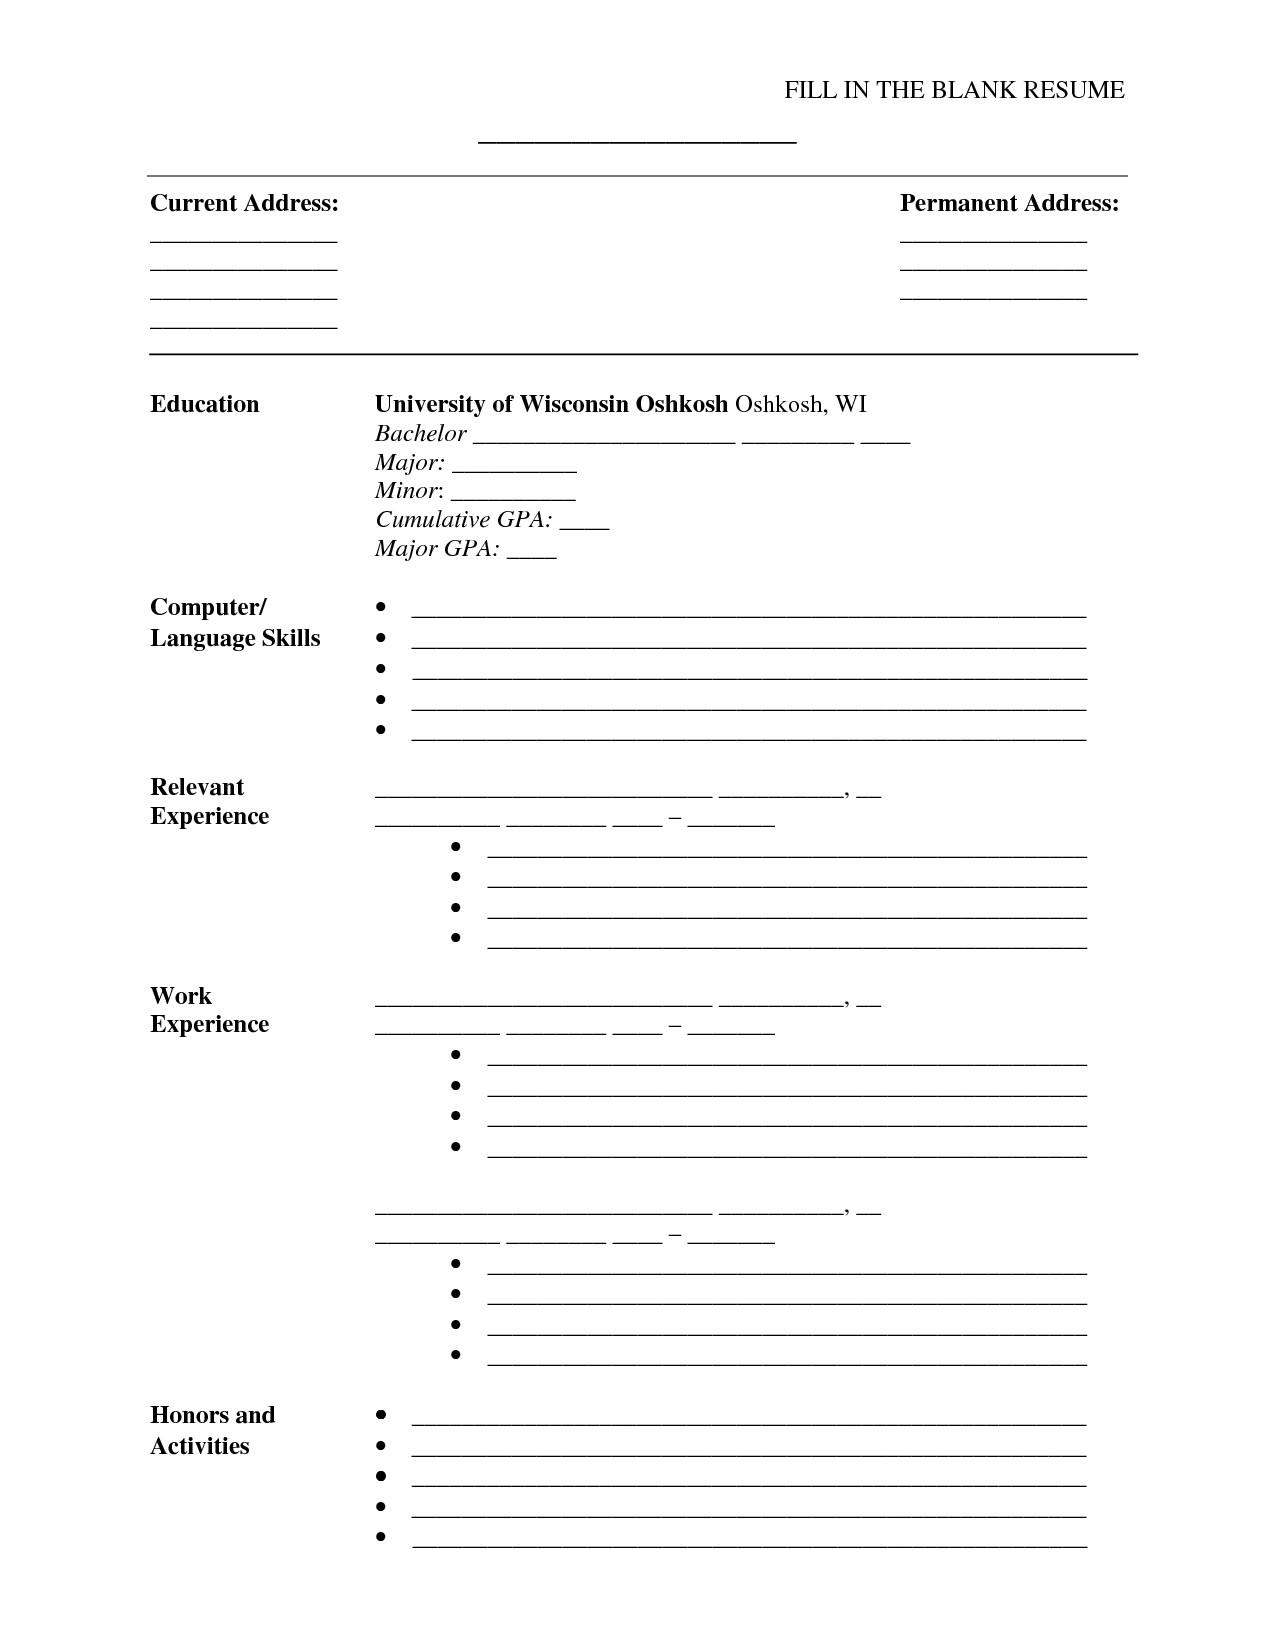 Fill In The Blank Resume PDF umecareer